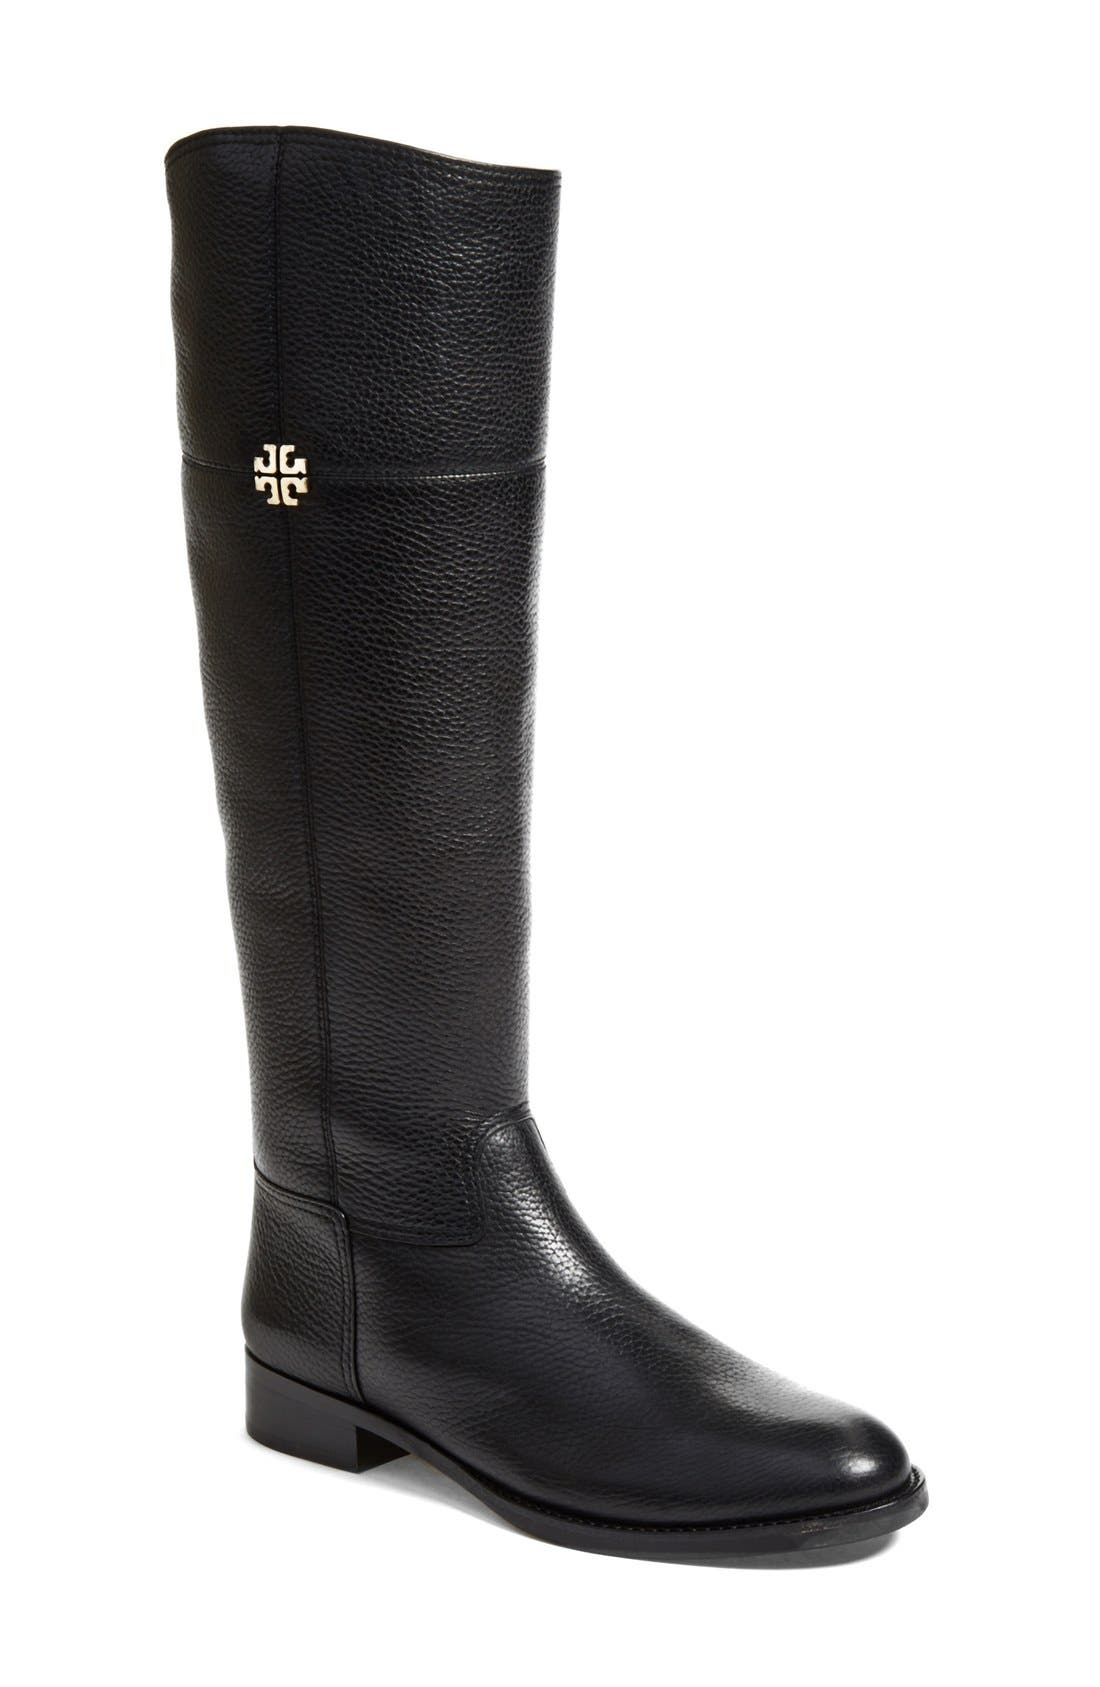 'Jolie' Riding Boot,                             Main thumbnail 1, color,                             Black Tumbled Leather